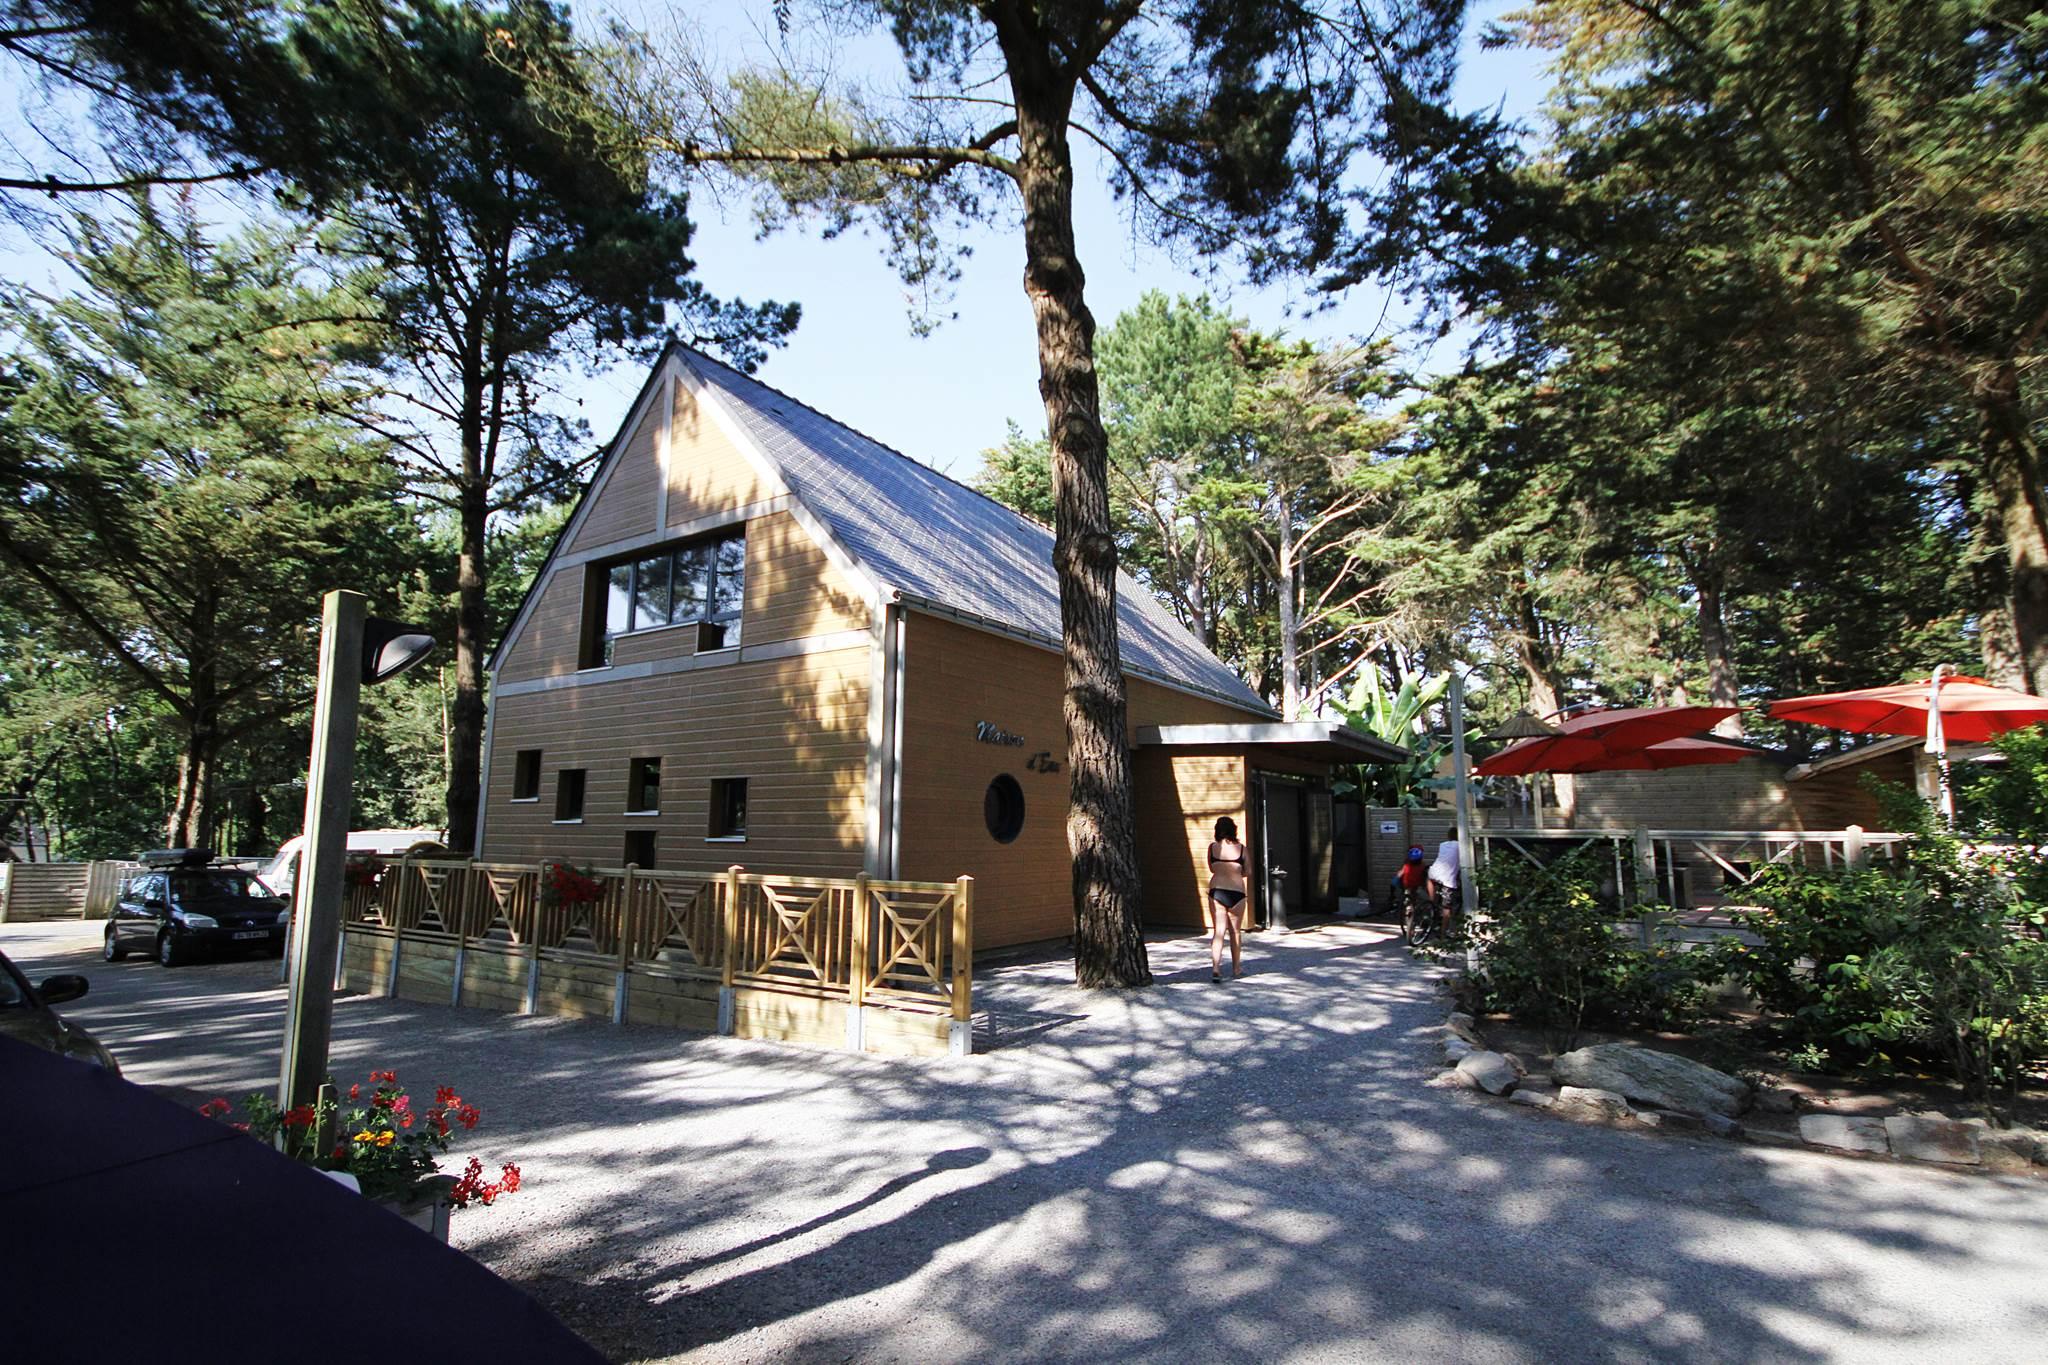 Camping Le Moulin De L'éclis | Campings Dans Le Morbihan ... à Camping Damgan Avec Piscine